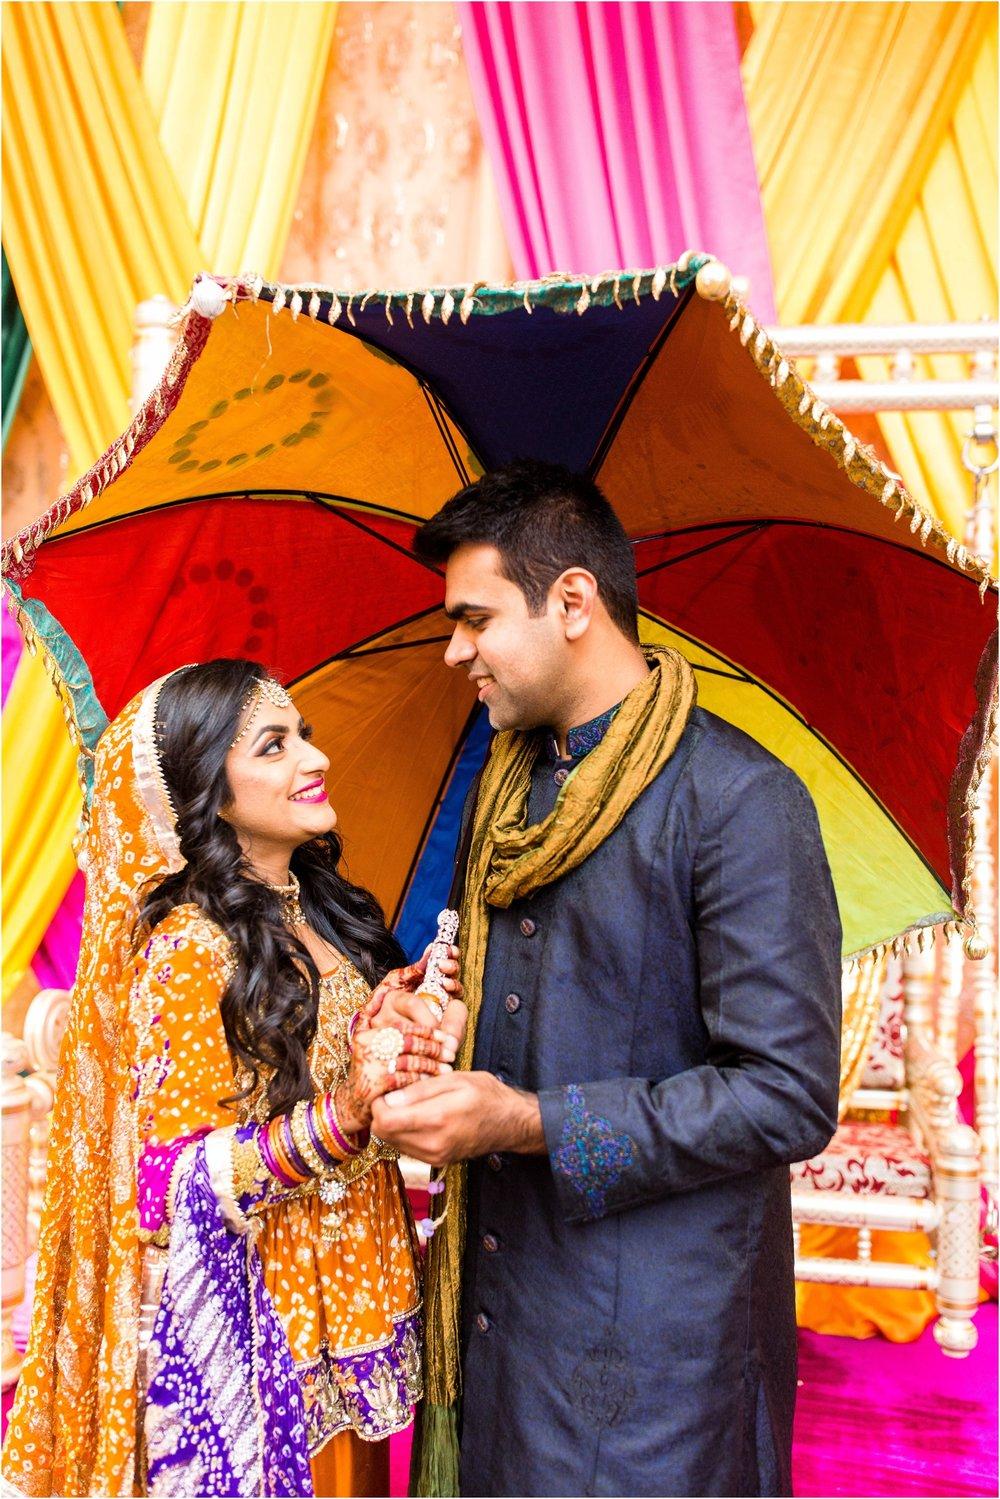 Best-of-2017-Weddings-Toronto-Mississauga-Brampton-Scarborough-GTA-Pakistani-Indian-Wedding-Engagement-Photographer-Photography_0127.jpg